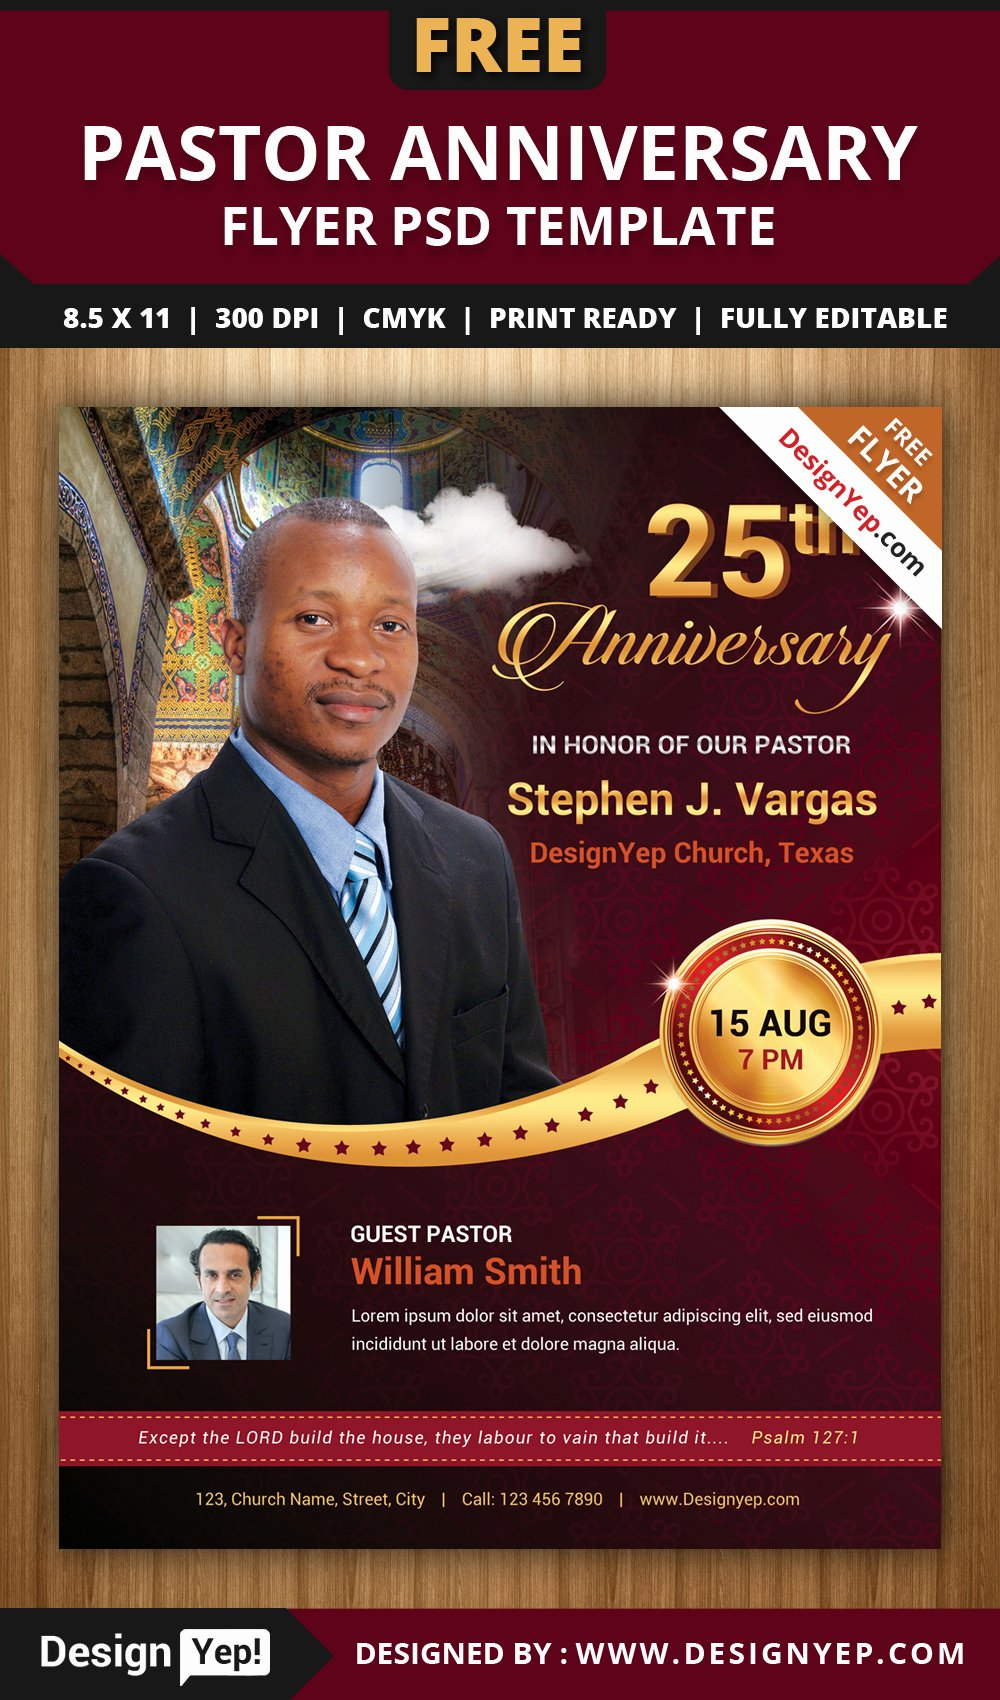 Free Church Program Template Inspirational Free Pastor Anniversary Flyer Psd Template Designyep